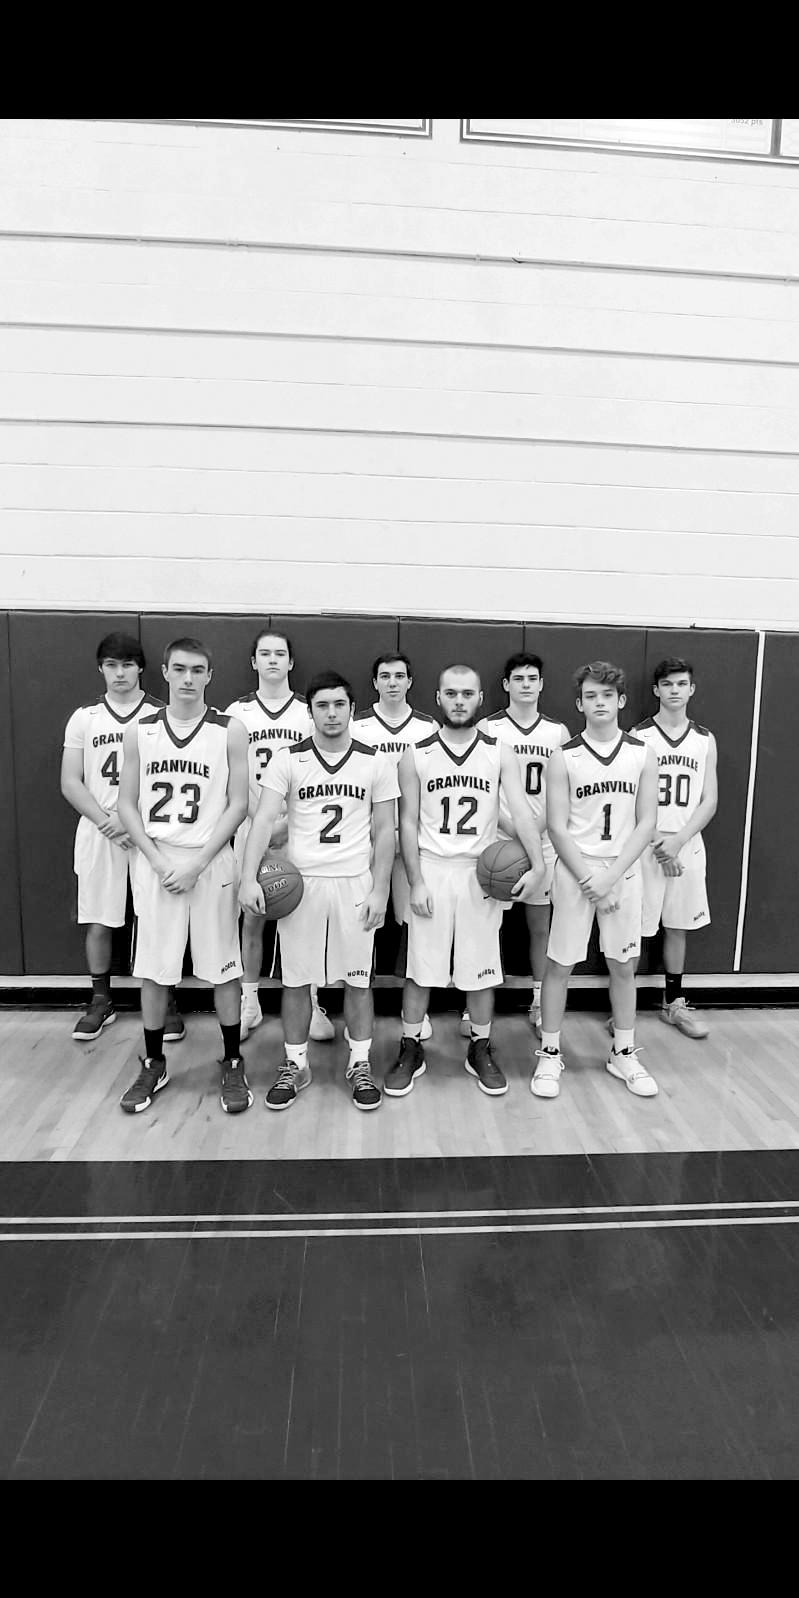 granville basketball